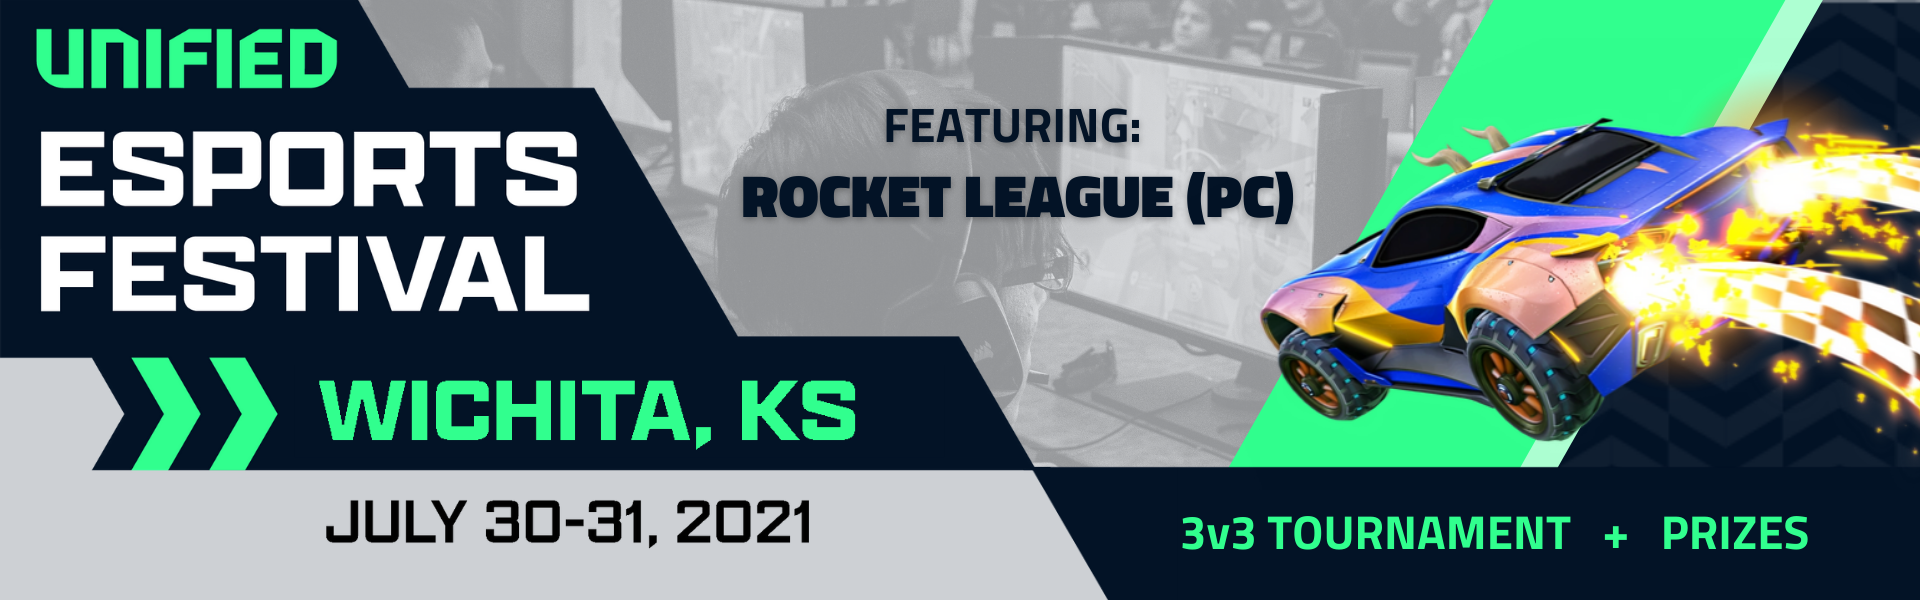 EF:ICT Featuring Rocket League (PC)